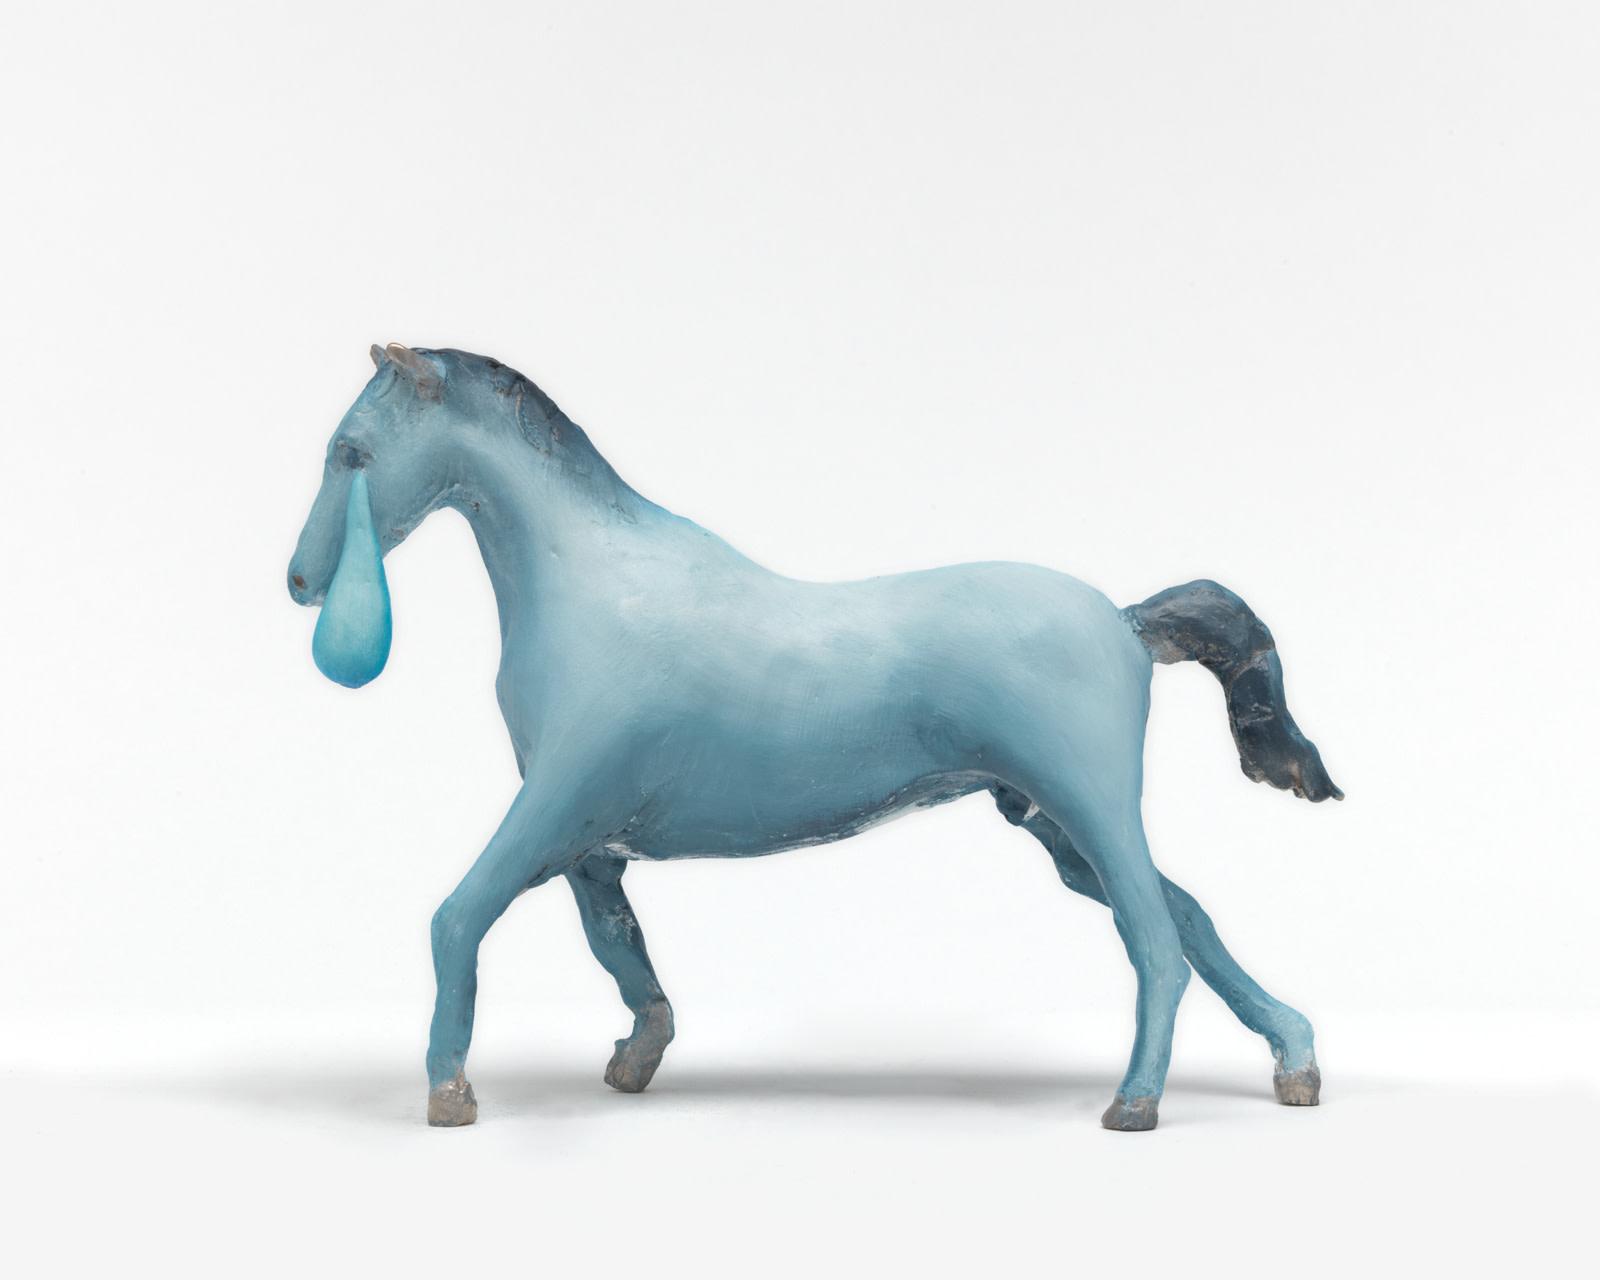 "<div class=""title""><em>Crying Horse</em>, 2016</div><div class=""medium"">cast bronze, oil paint</div><div class=""dimensions"">22.2 x 31.8 x 8.9 cm<br />8 3/4 x 12 1/2 x 3 1/2 in.</div>"